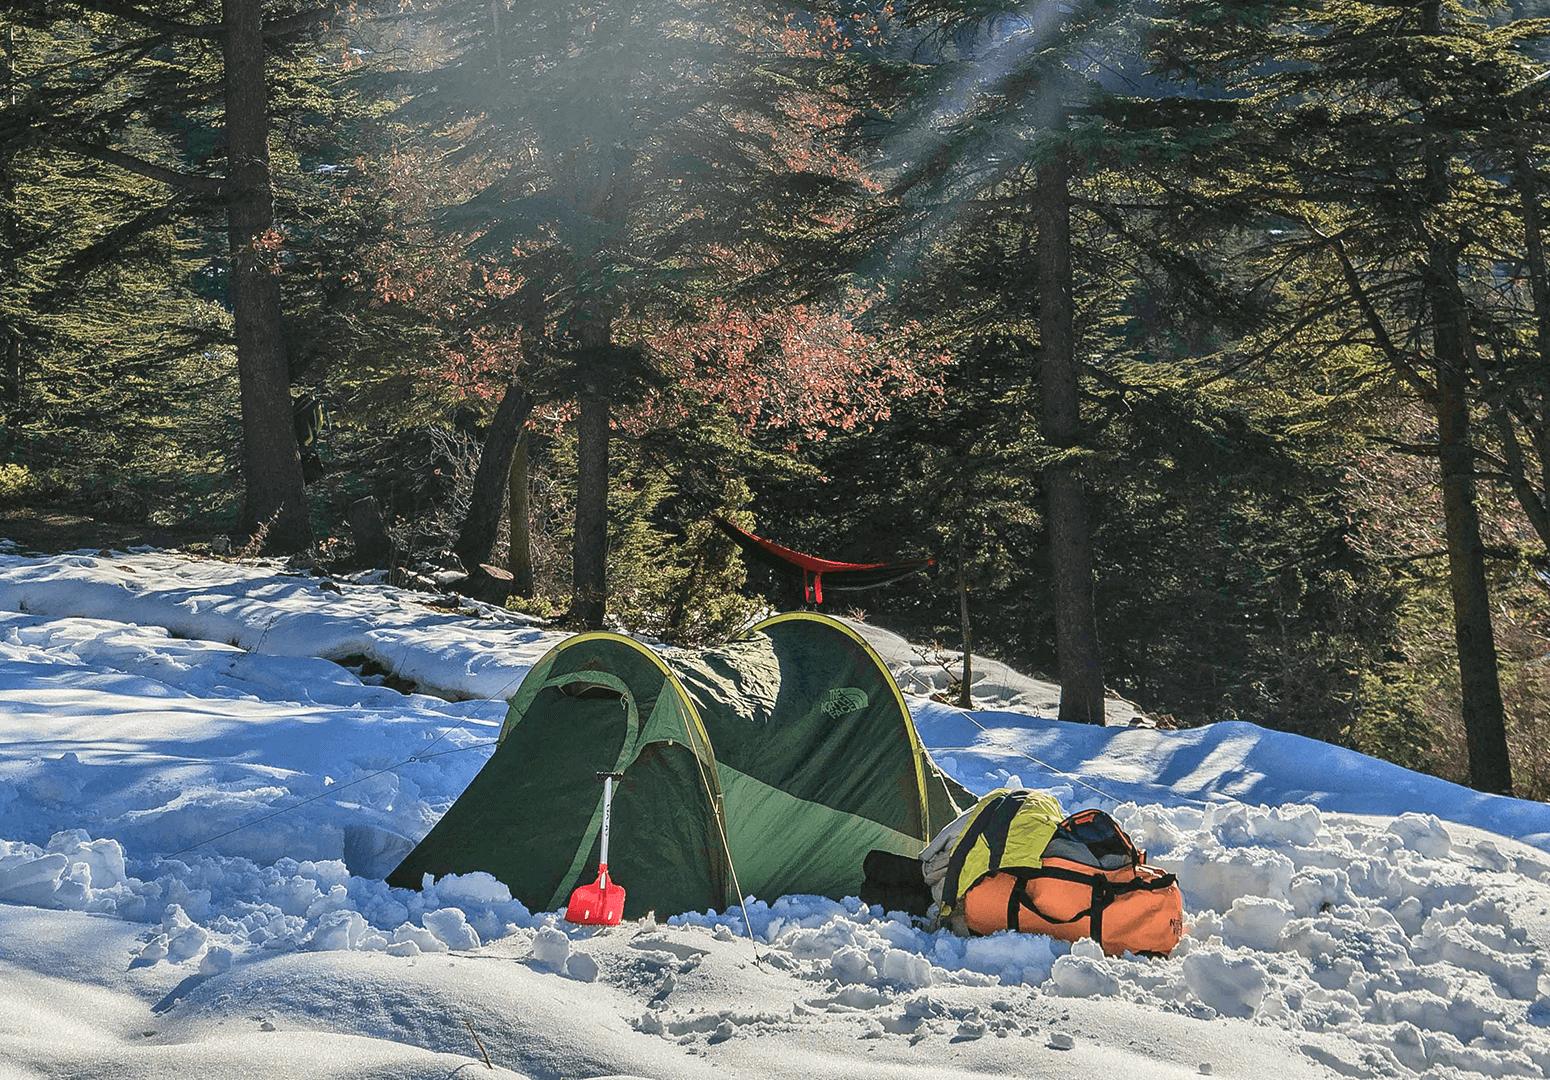 b1535-7ac61-camping.png